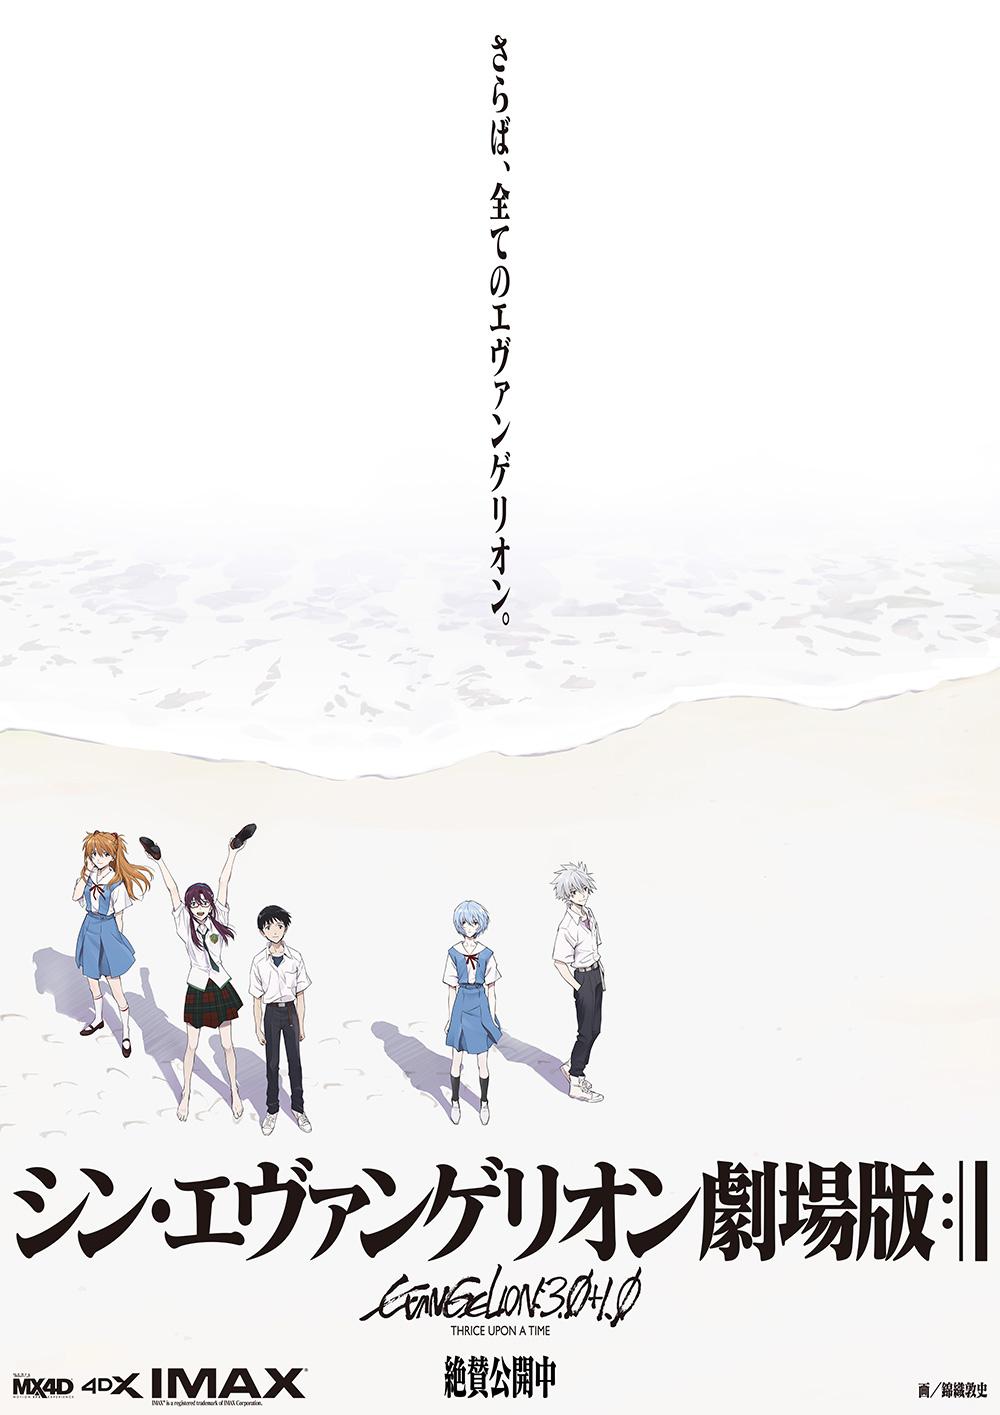 Evangelion-3.0-+-1.0-Visual-04v2